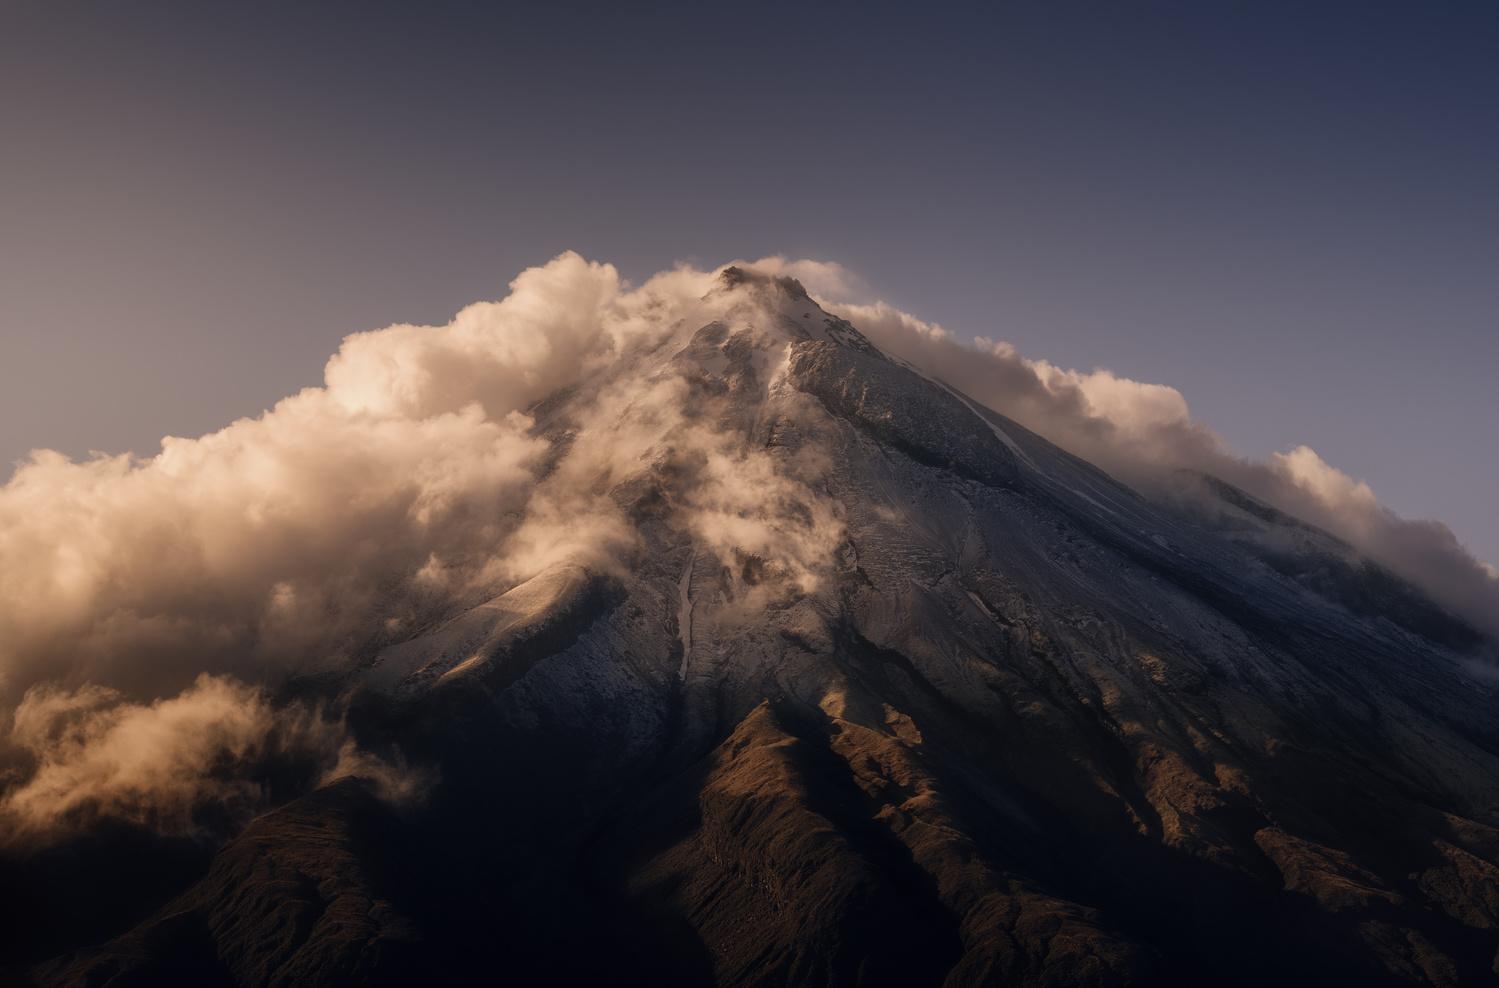 Mt. Taranaki, New Zealand by DaniGviews /Daniel